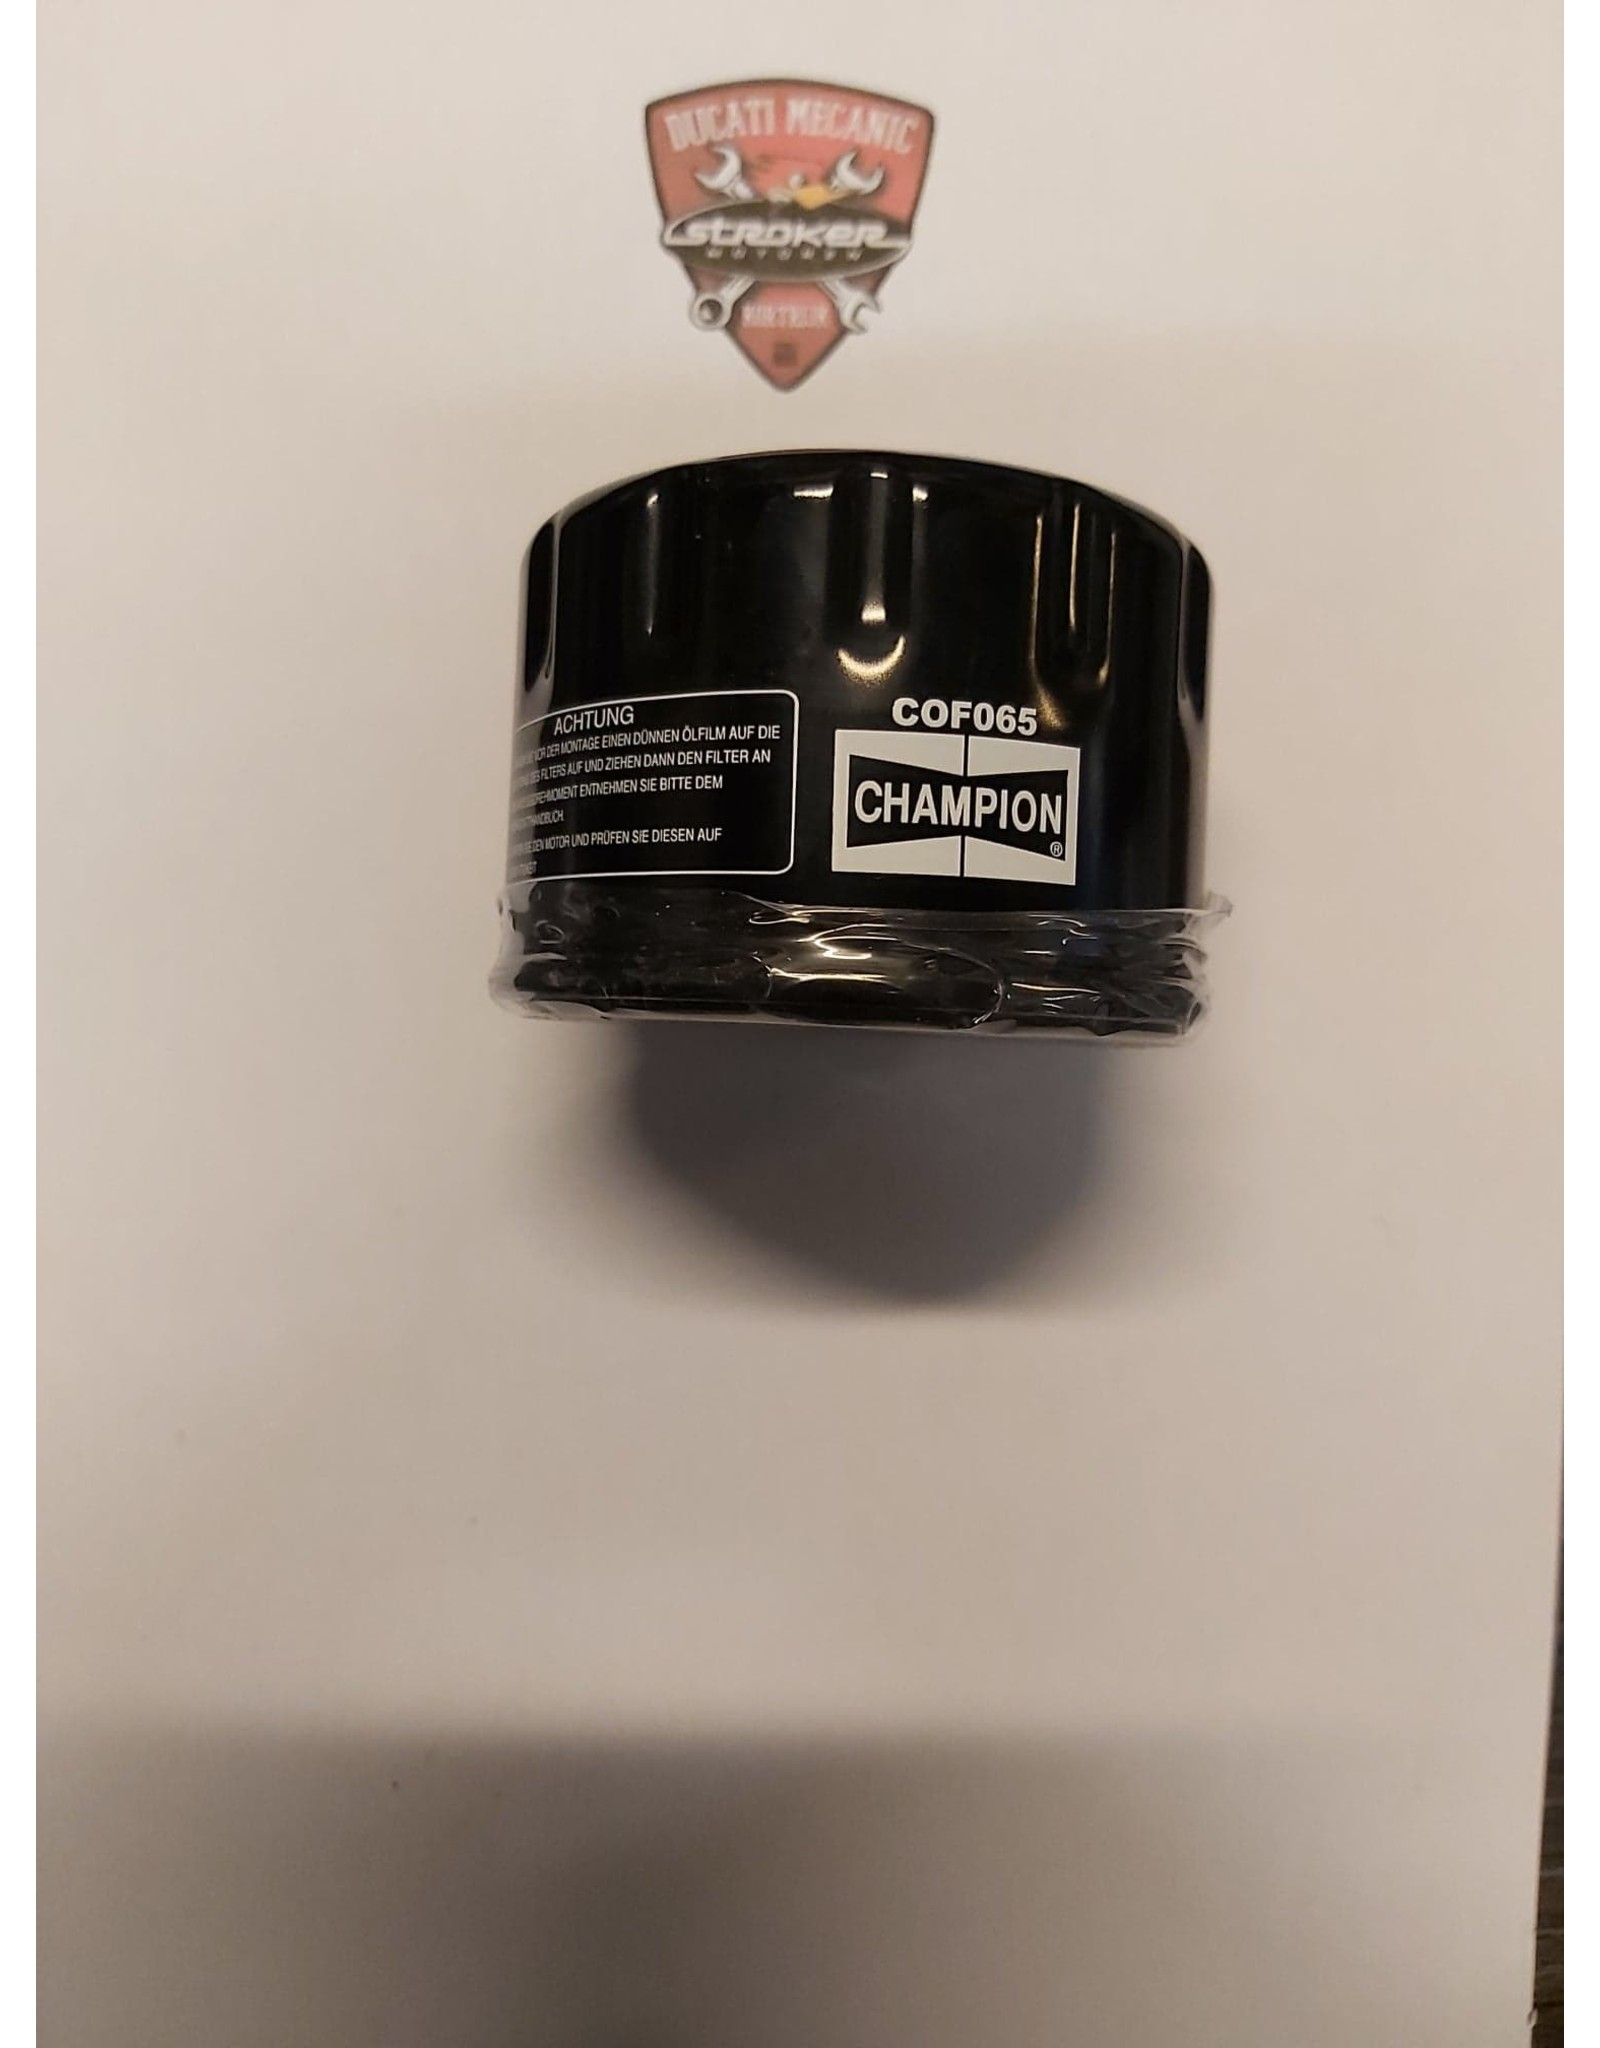 CHAMPION OLIEFILTER CHAMPION COF 065 (bmw)